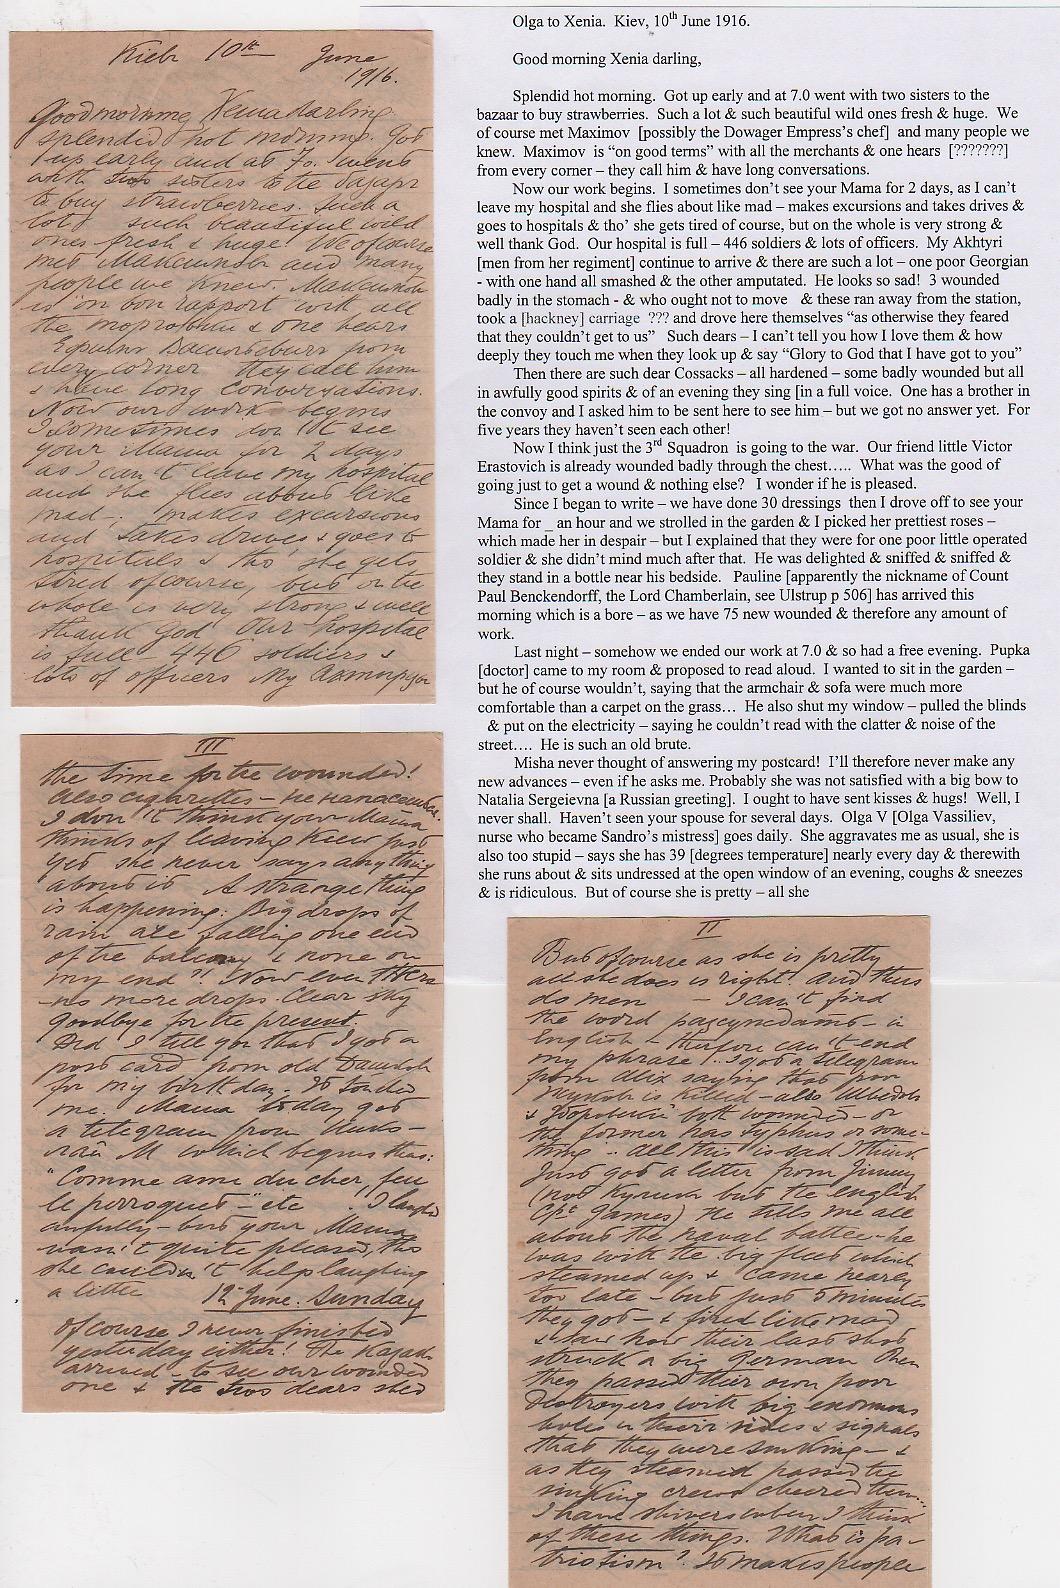 Royalty Grand Duchess Olga Correspondence To Her Sister Grand Duchess Xenia 1916-1920 - Image 40 of 47